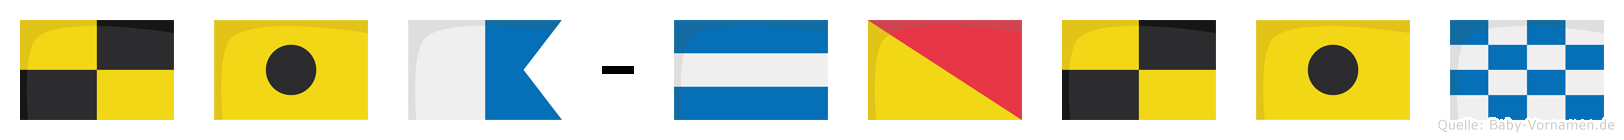 Lia-Jolin im Flaggenalphabet